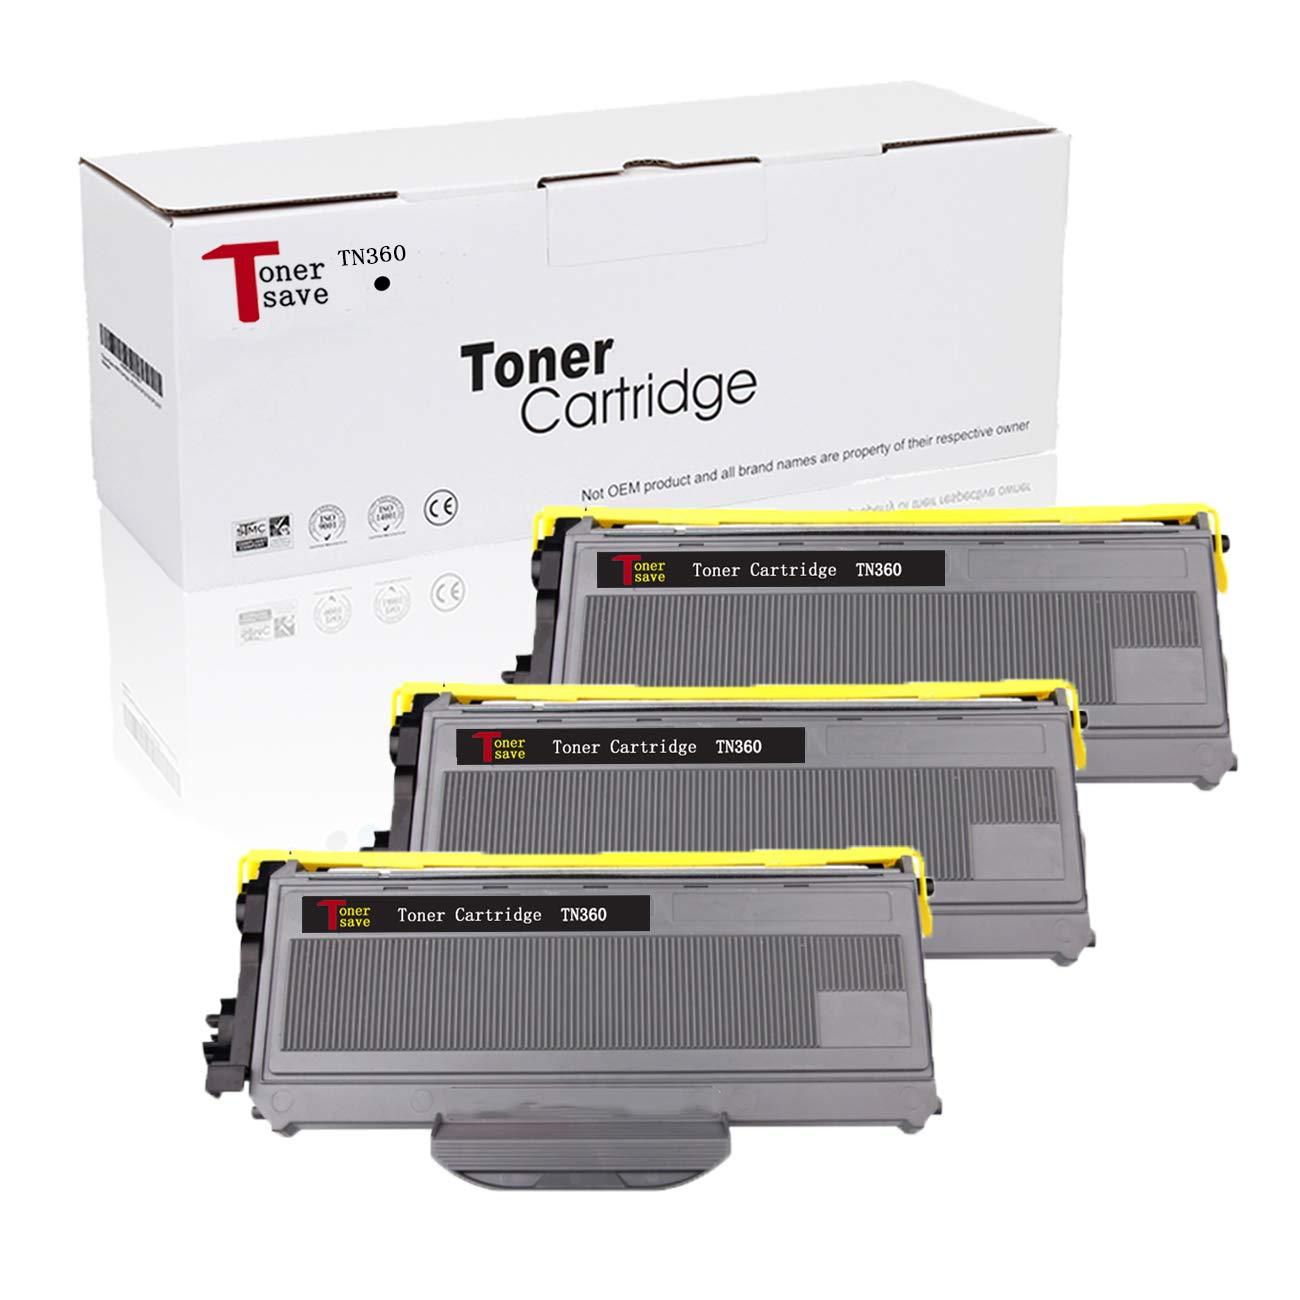 Tonersave Compatible TN-360 TN360 Toner Cartridge for Brother HL-2140 HL-2170 HL-2170W MFC-7840W MFC-7440N DCP-7030 MFC-7345N MFC-7345DN Ricoh Aficio SP 1210 Series Laser Printer Black 3-Pack